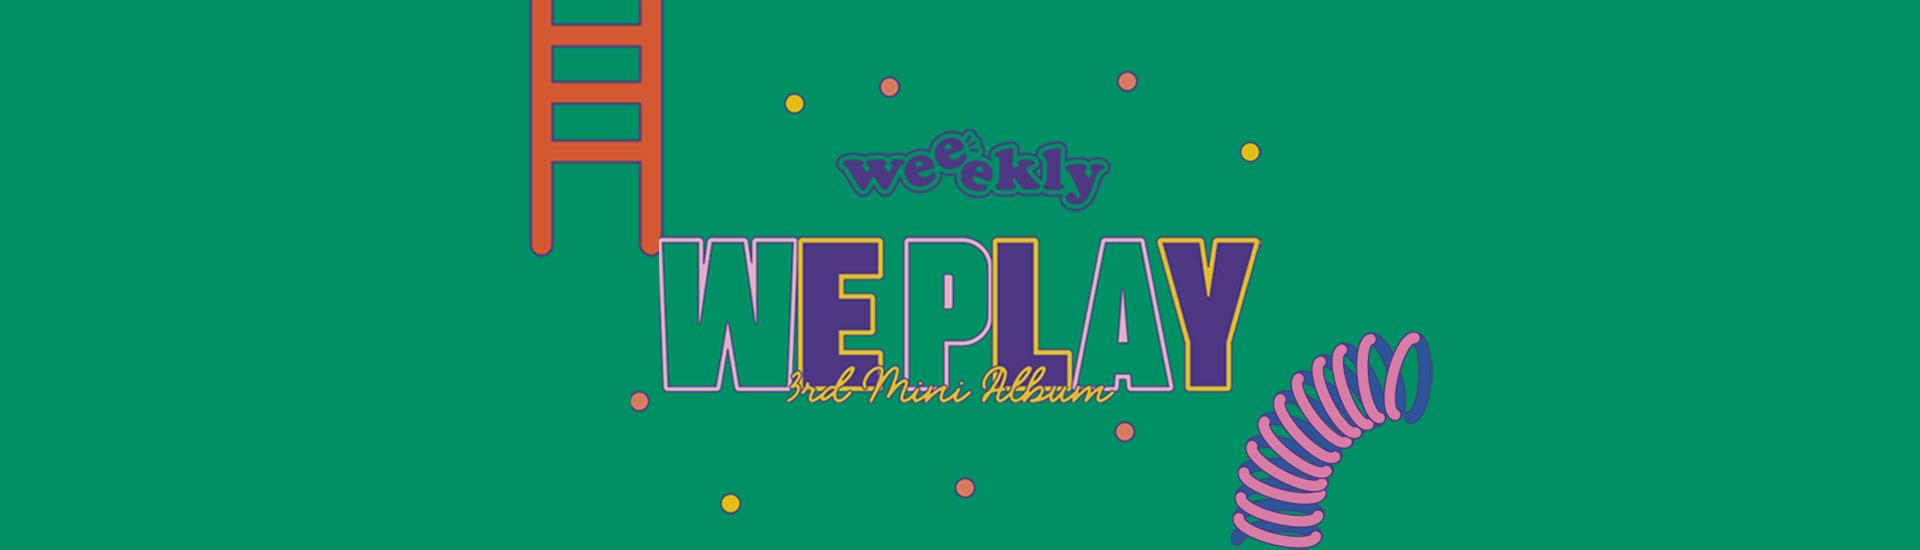 Weeekly -  [We play] Global Video Call